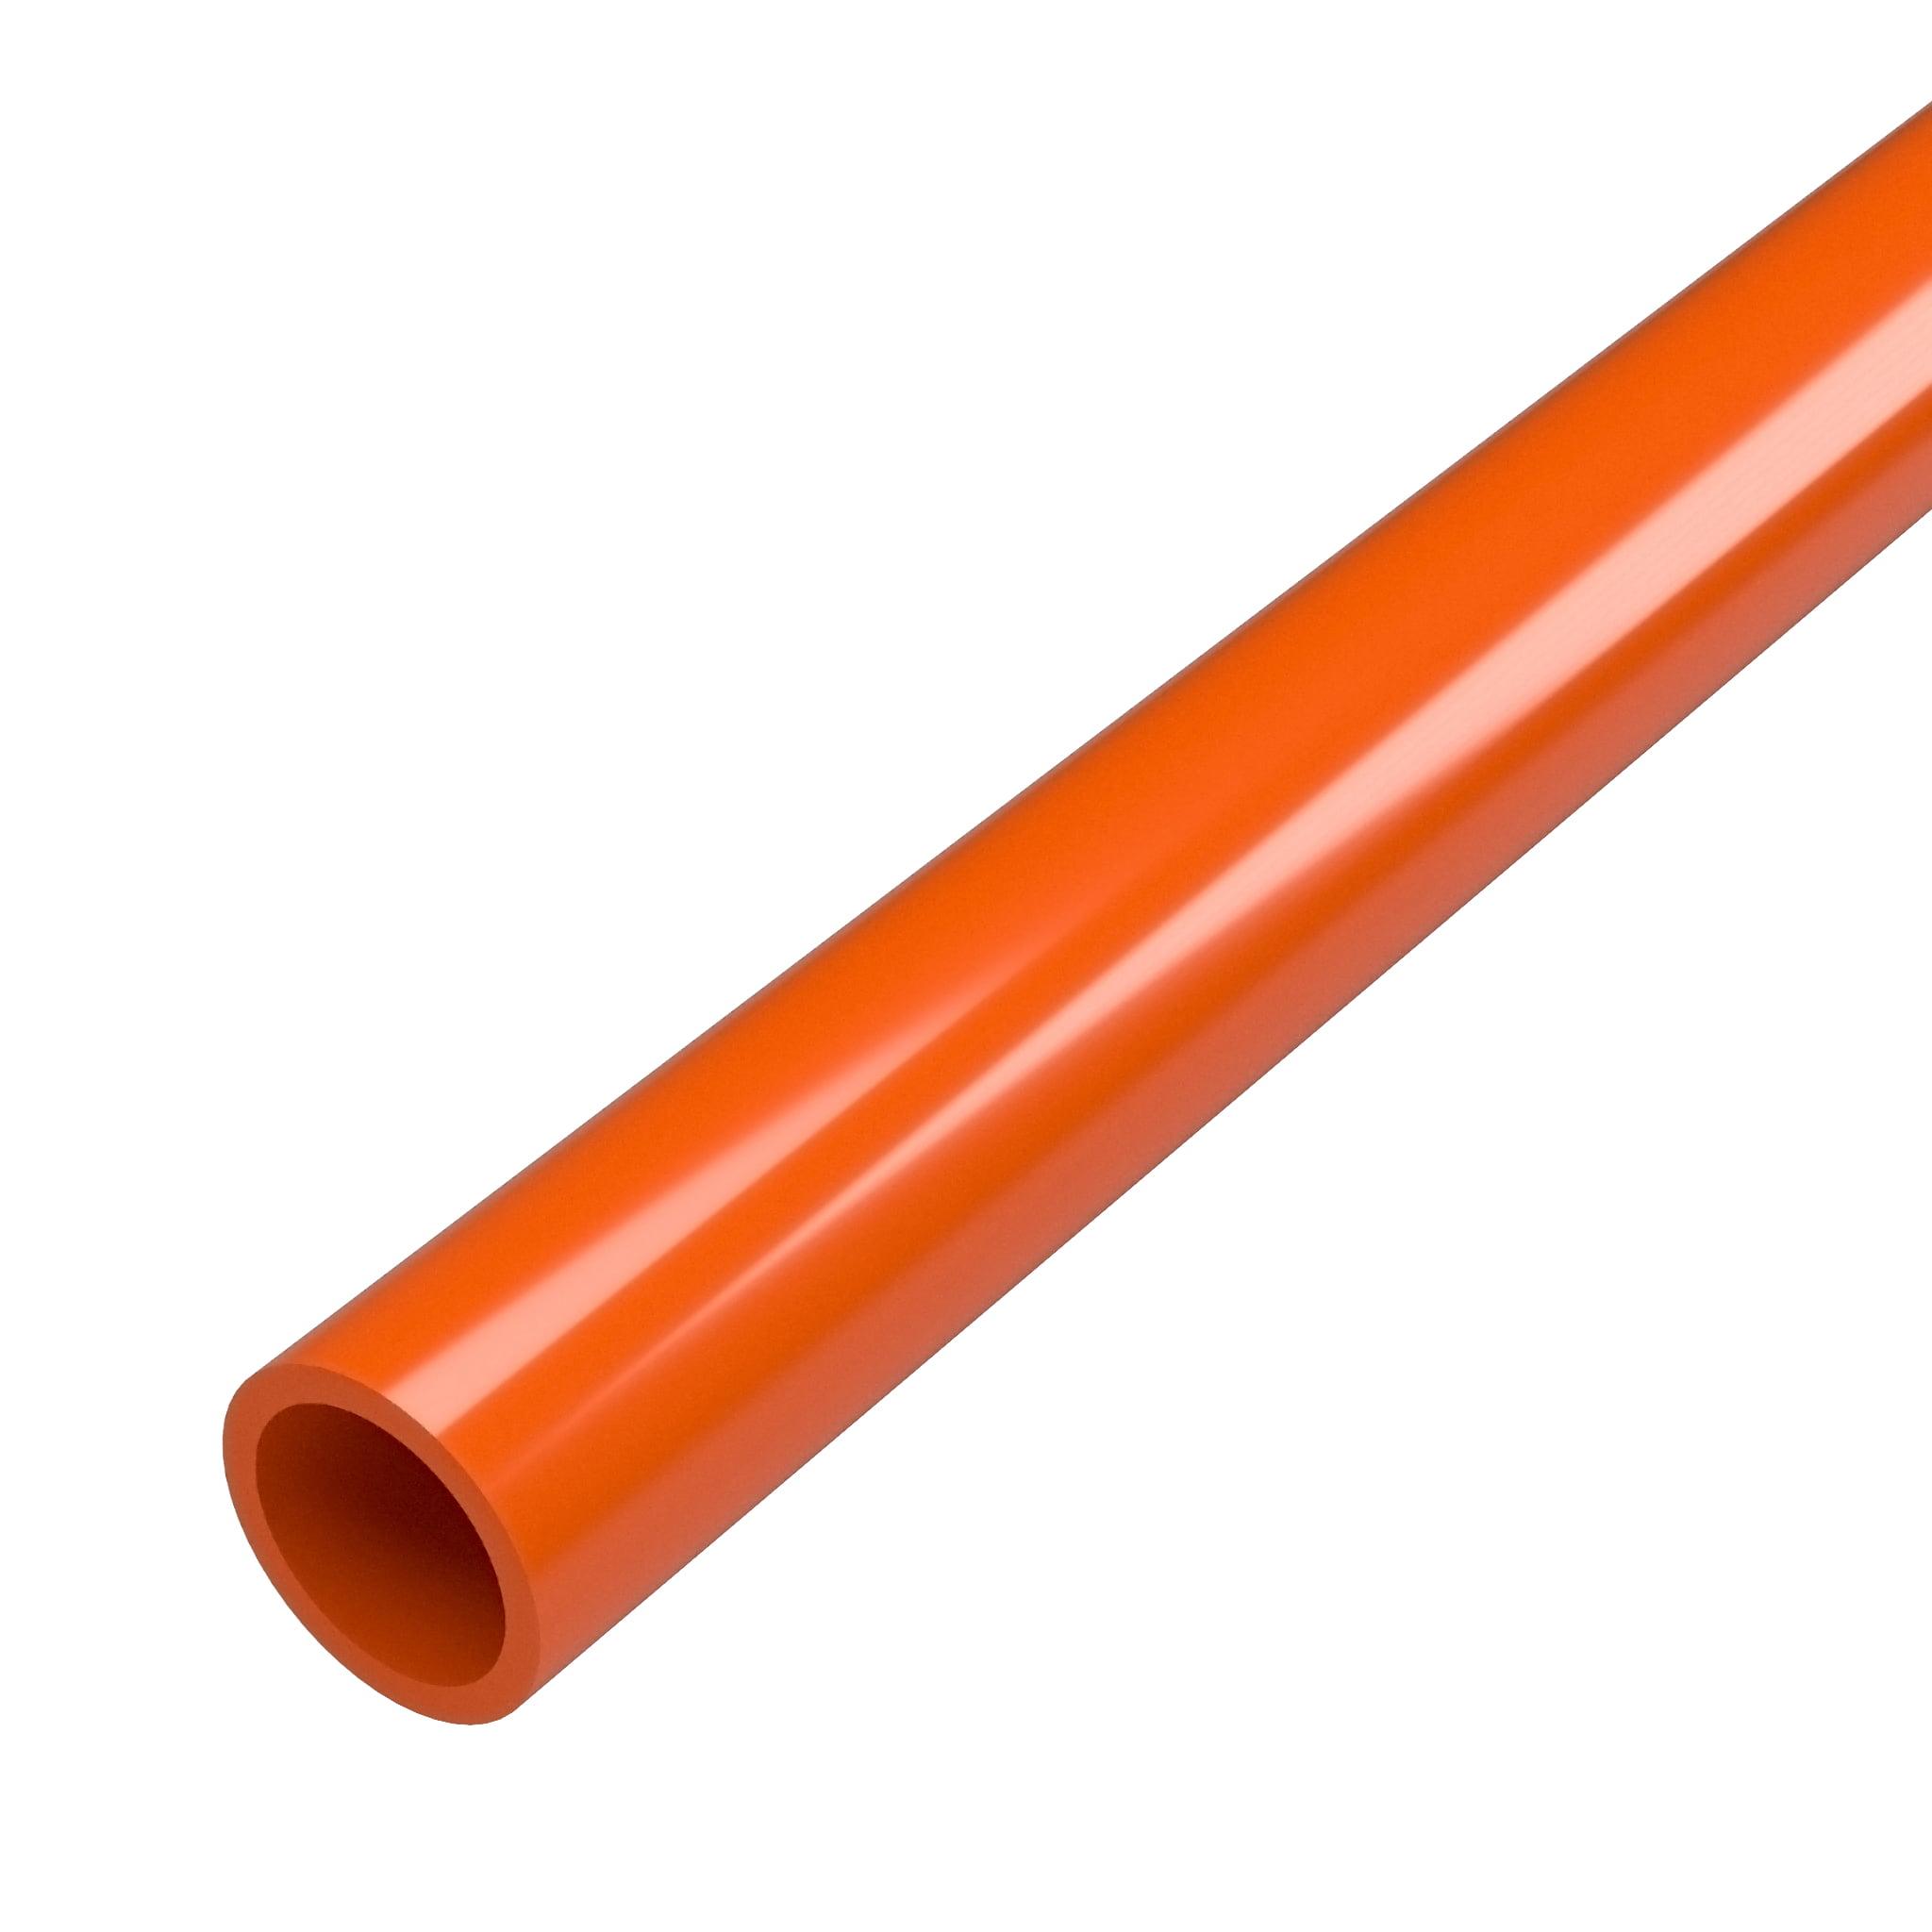 "FORMUFIT P034FGP-OR-5 Schedule 40 PVC Pipe, Furniture Grade, 5-Feet, 3/4"" Size, Orange"